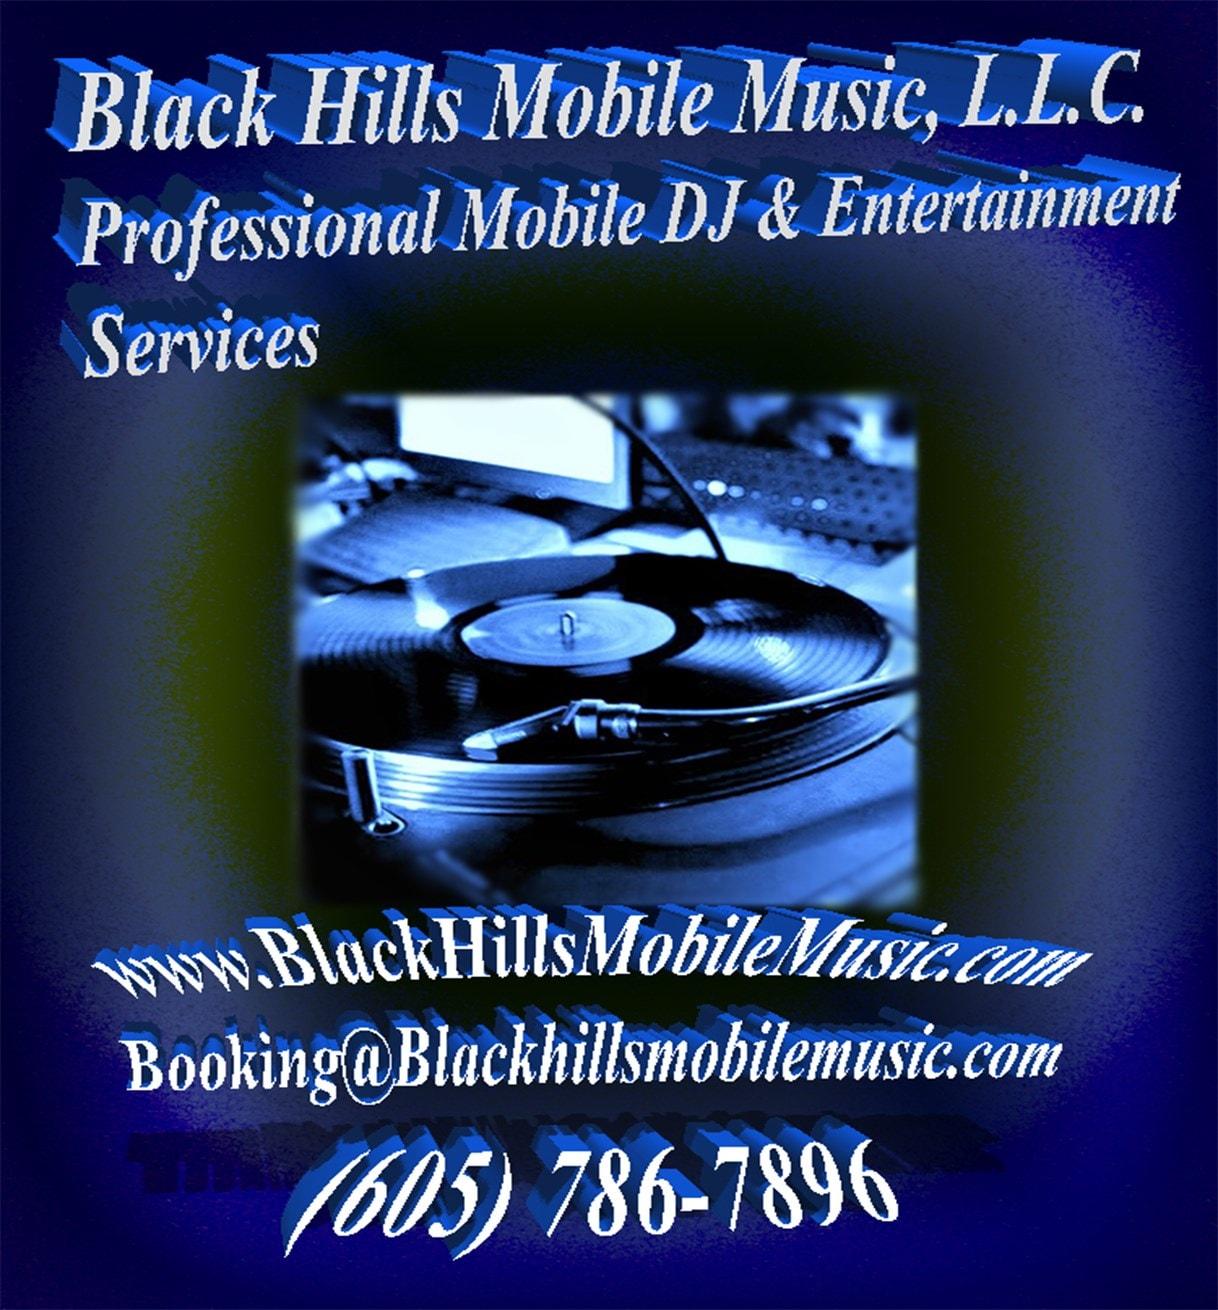 Black Hills Mobile Music, LLC